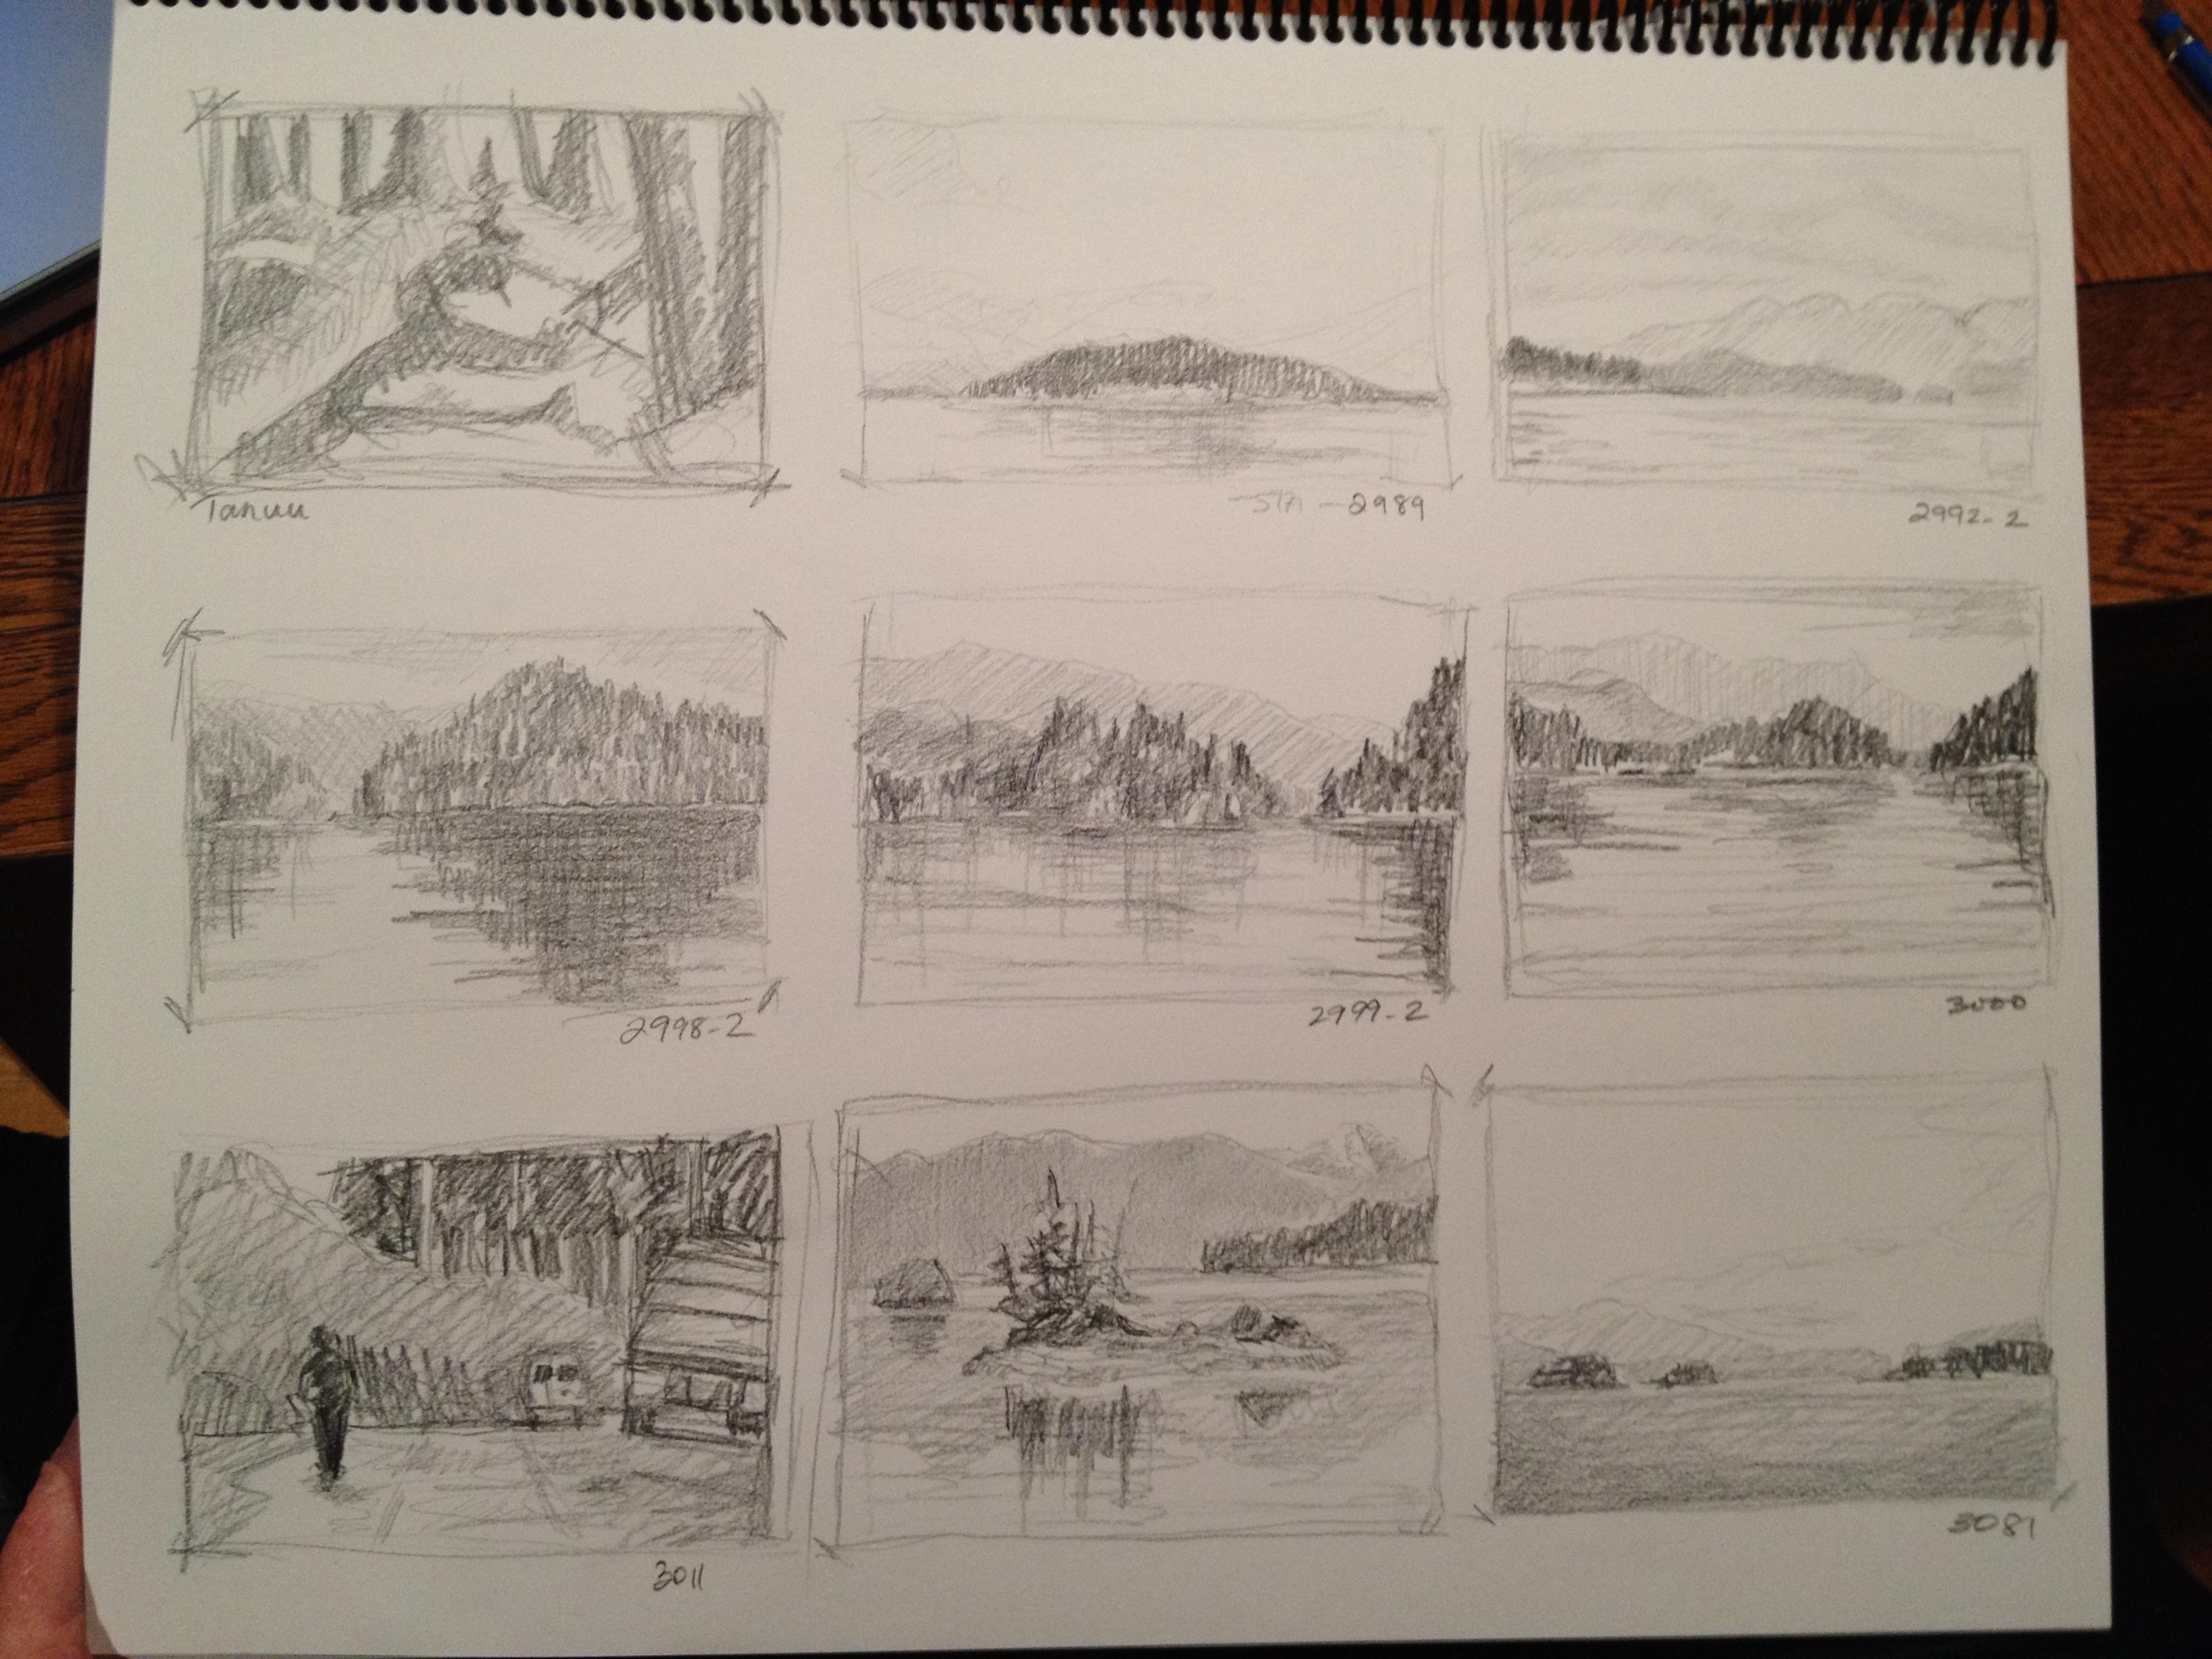 Thumbnail Sketches - Janice Tanton, Gwaii Haanas National Park